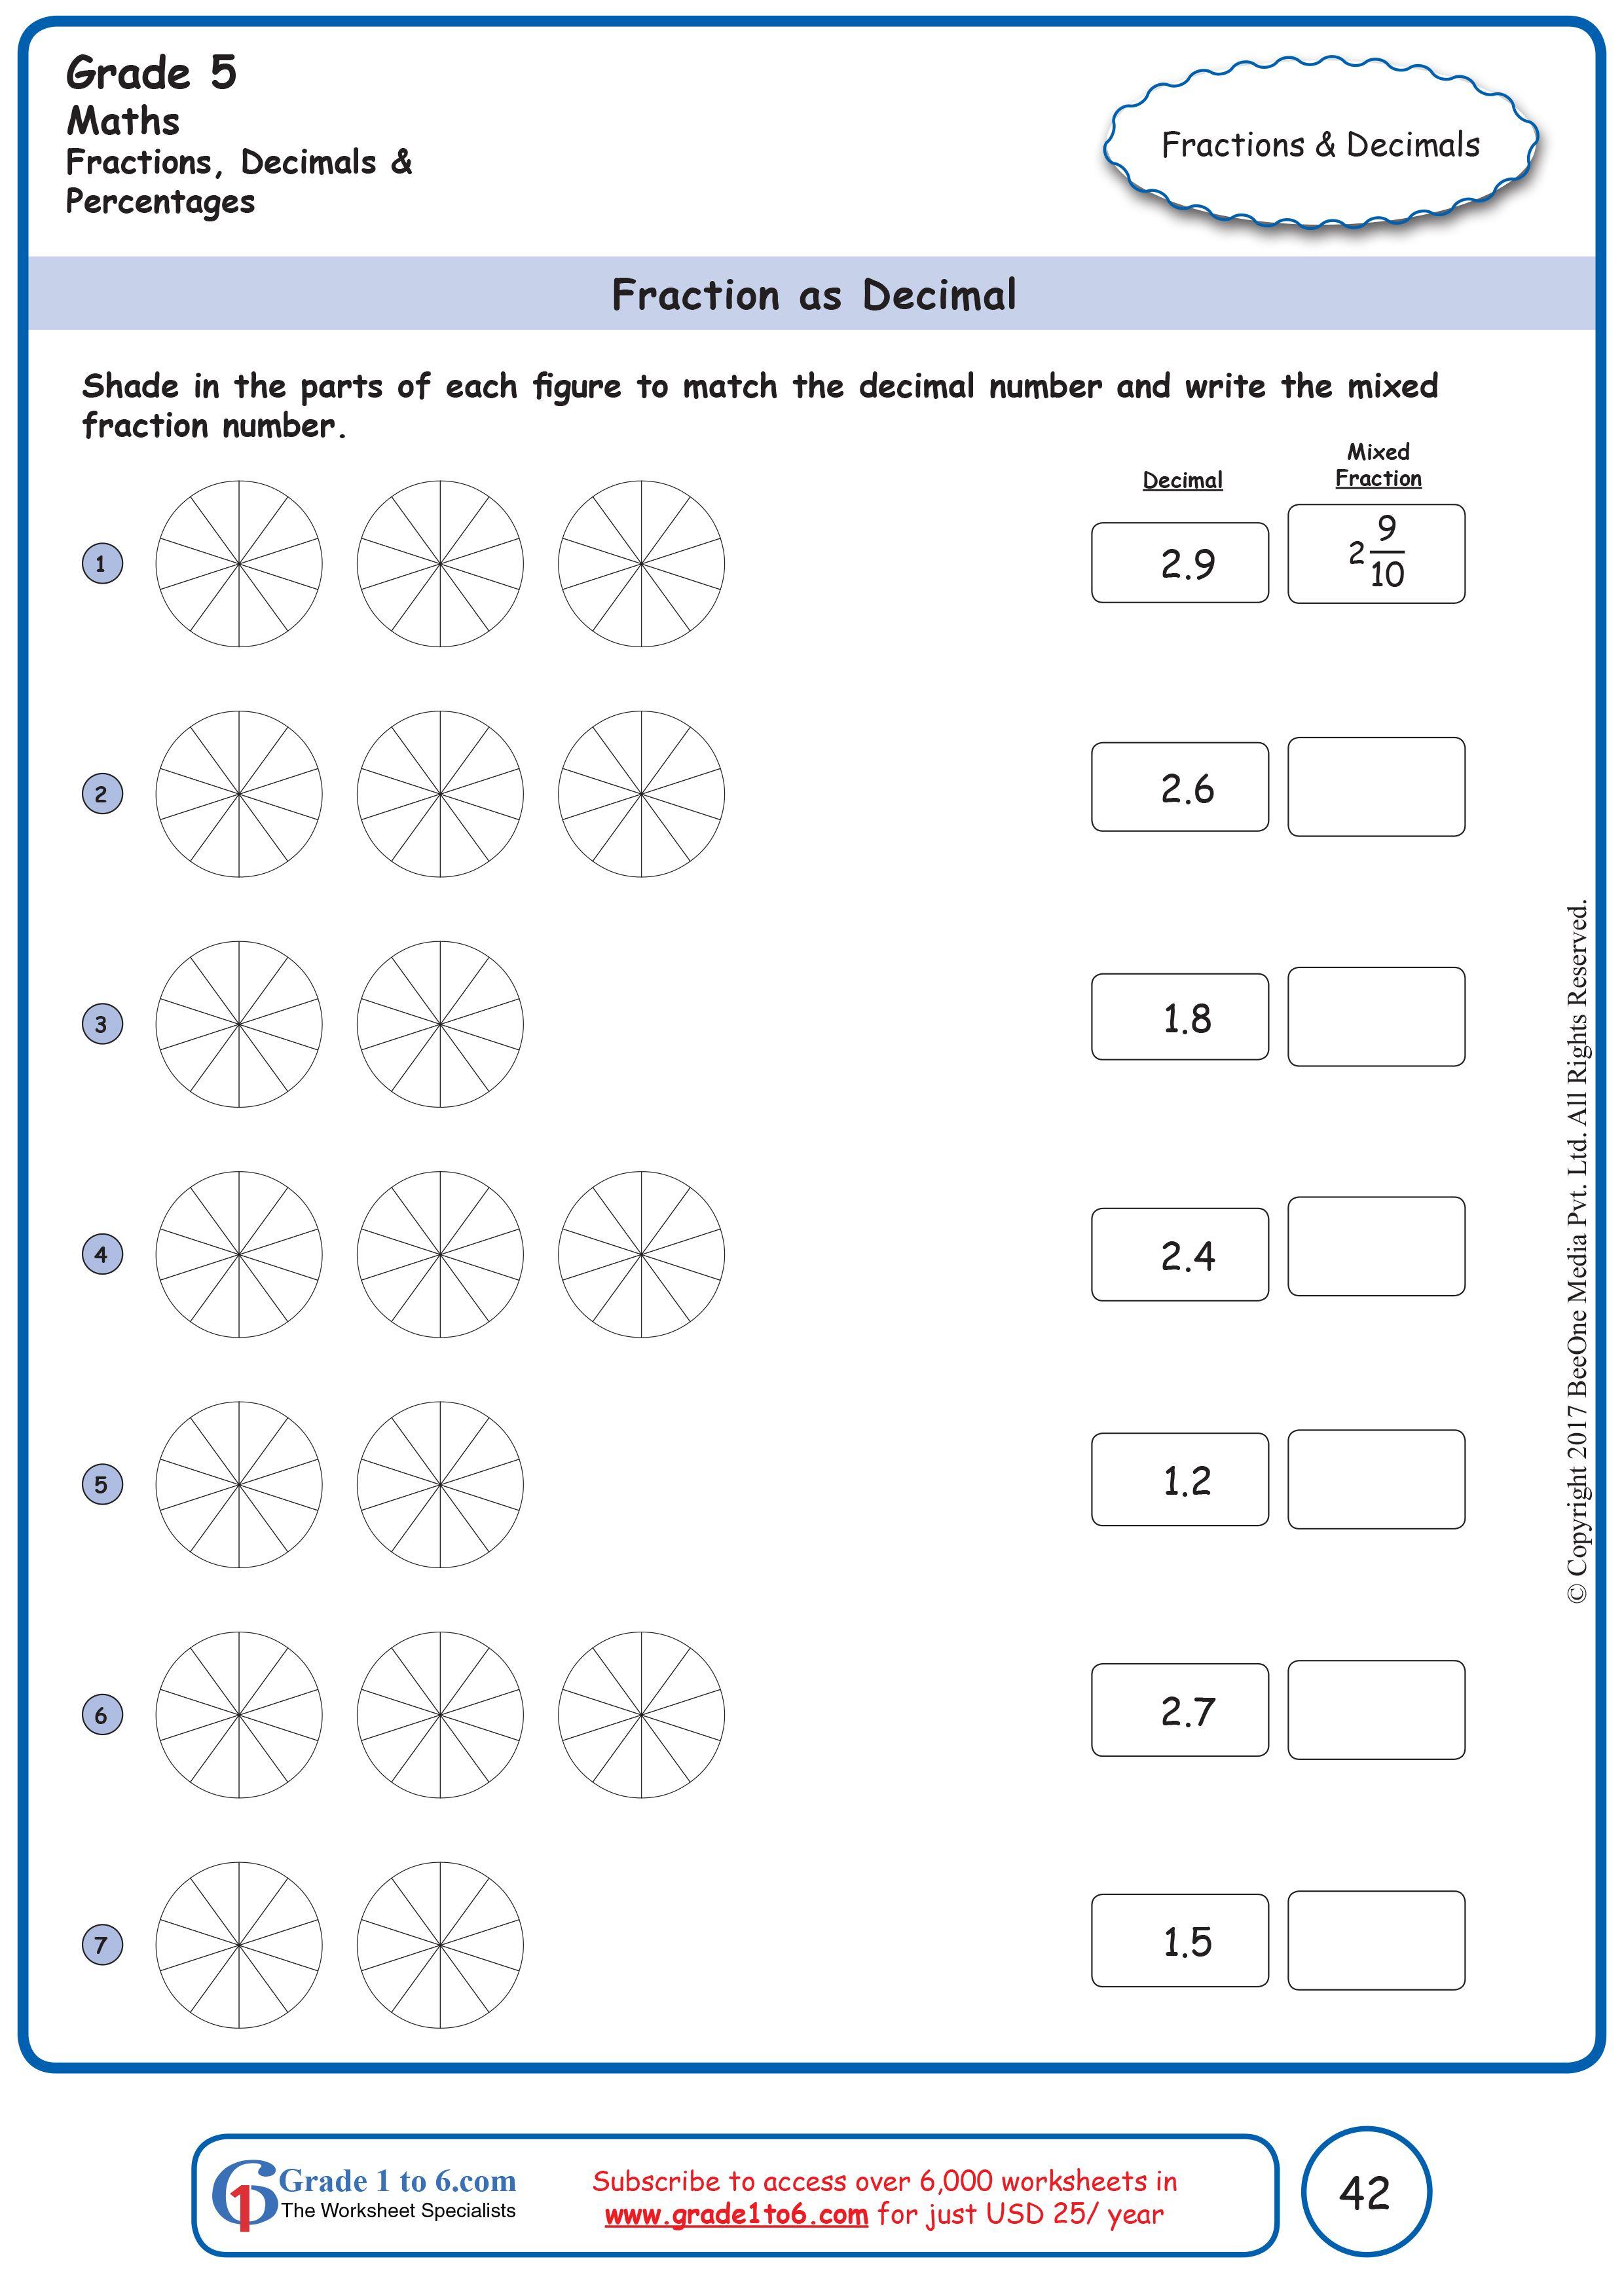 Fractions As Decimals Grade 5 Math Free Math Worksheets Math Worksheets Math Fractions Maths worksheet for class fraction